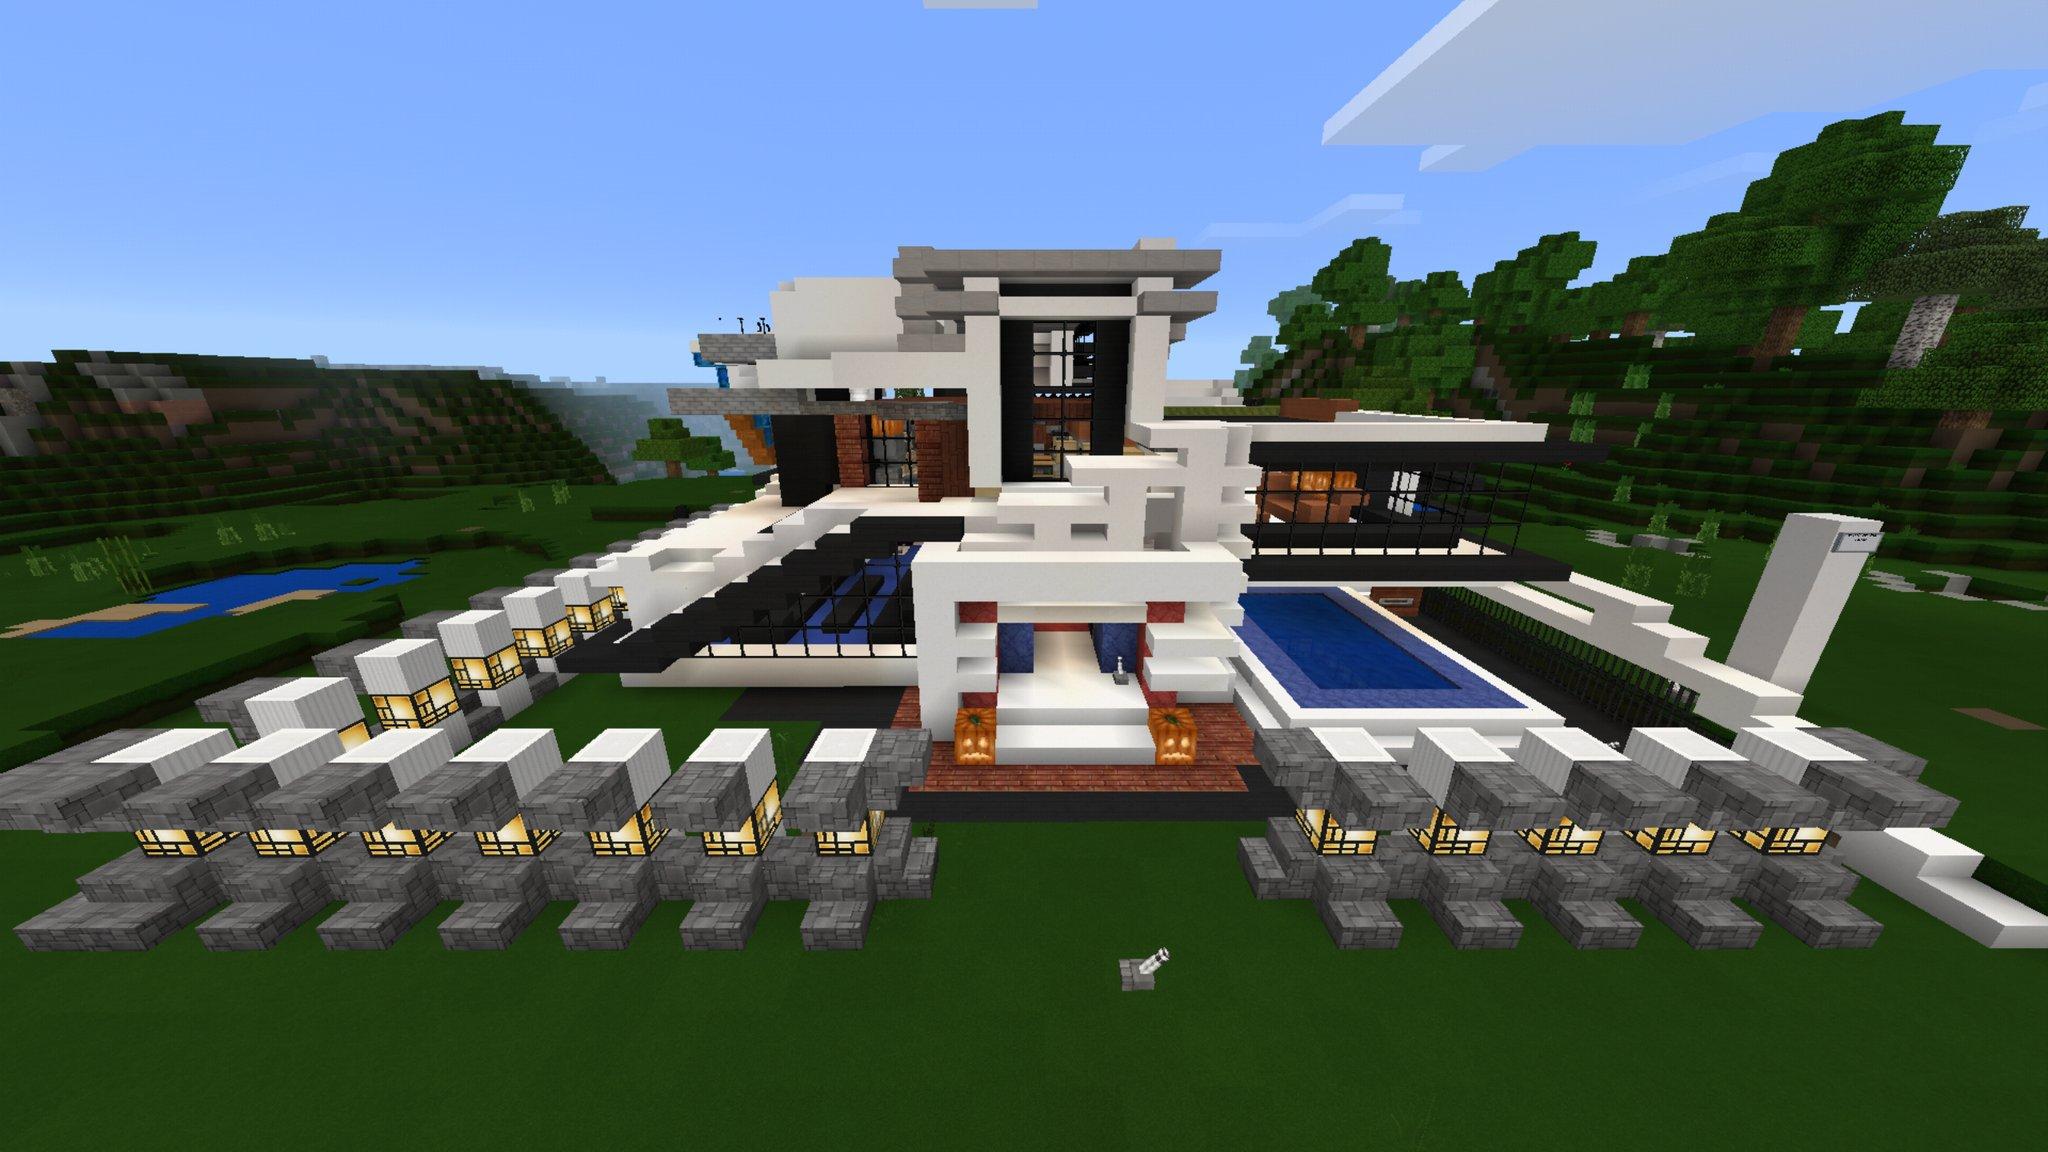 Minecraft redstone house maps map chicago best cities visit us s eyb7uw minecraft redstone house mapshtml